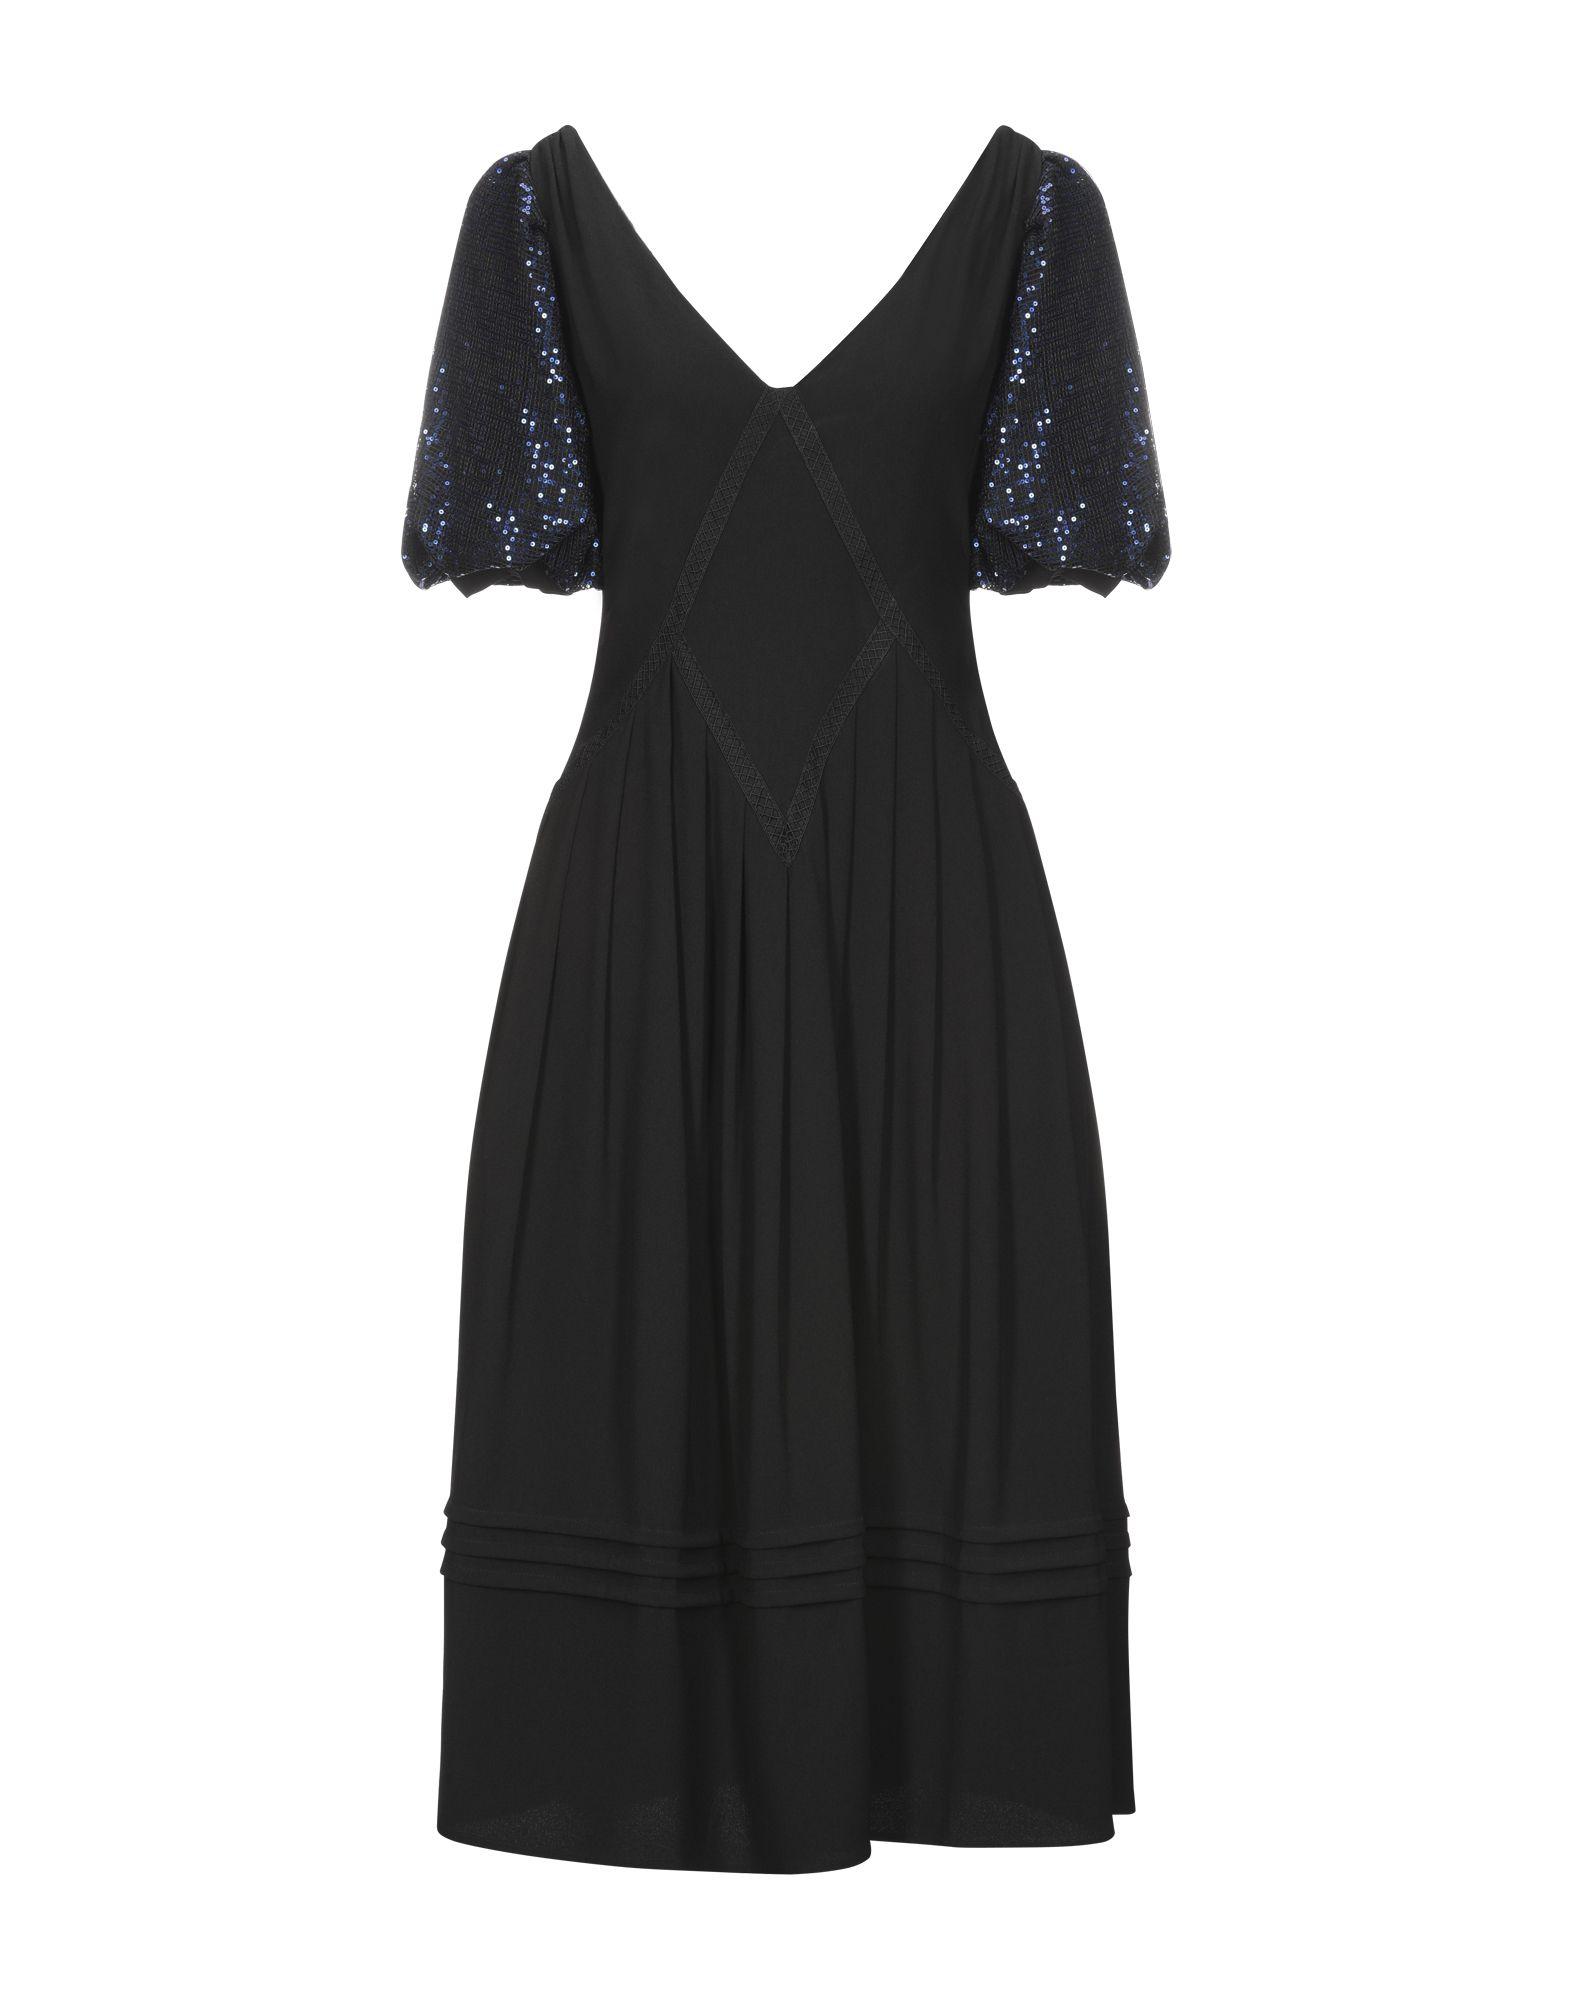 Фото - SELF-PORTRAIT Платье длиной 3/4 zanmax wxc8 6 4 self adjusting crimping plier